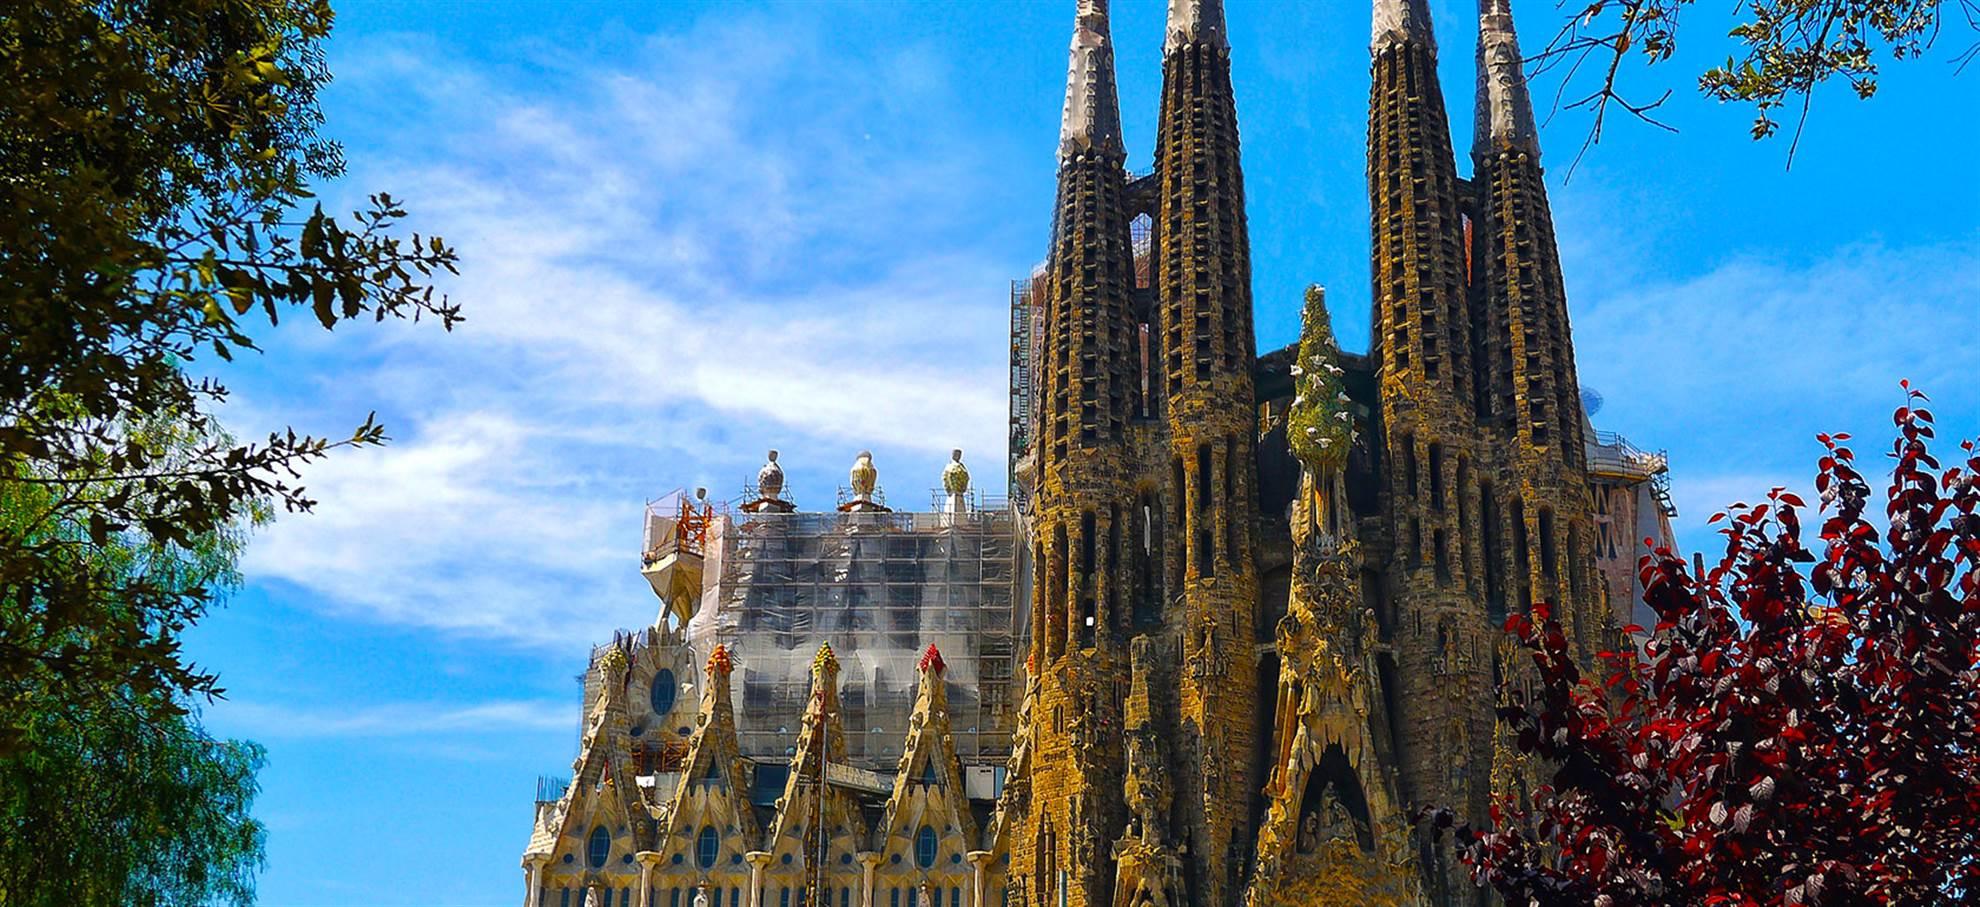 Sagrada Familia + Audioprzewodnik i autobus Hop on Hop off